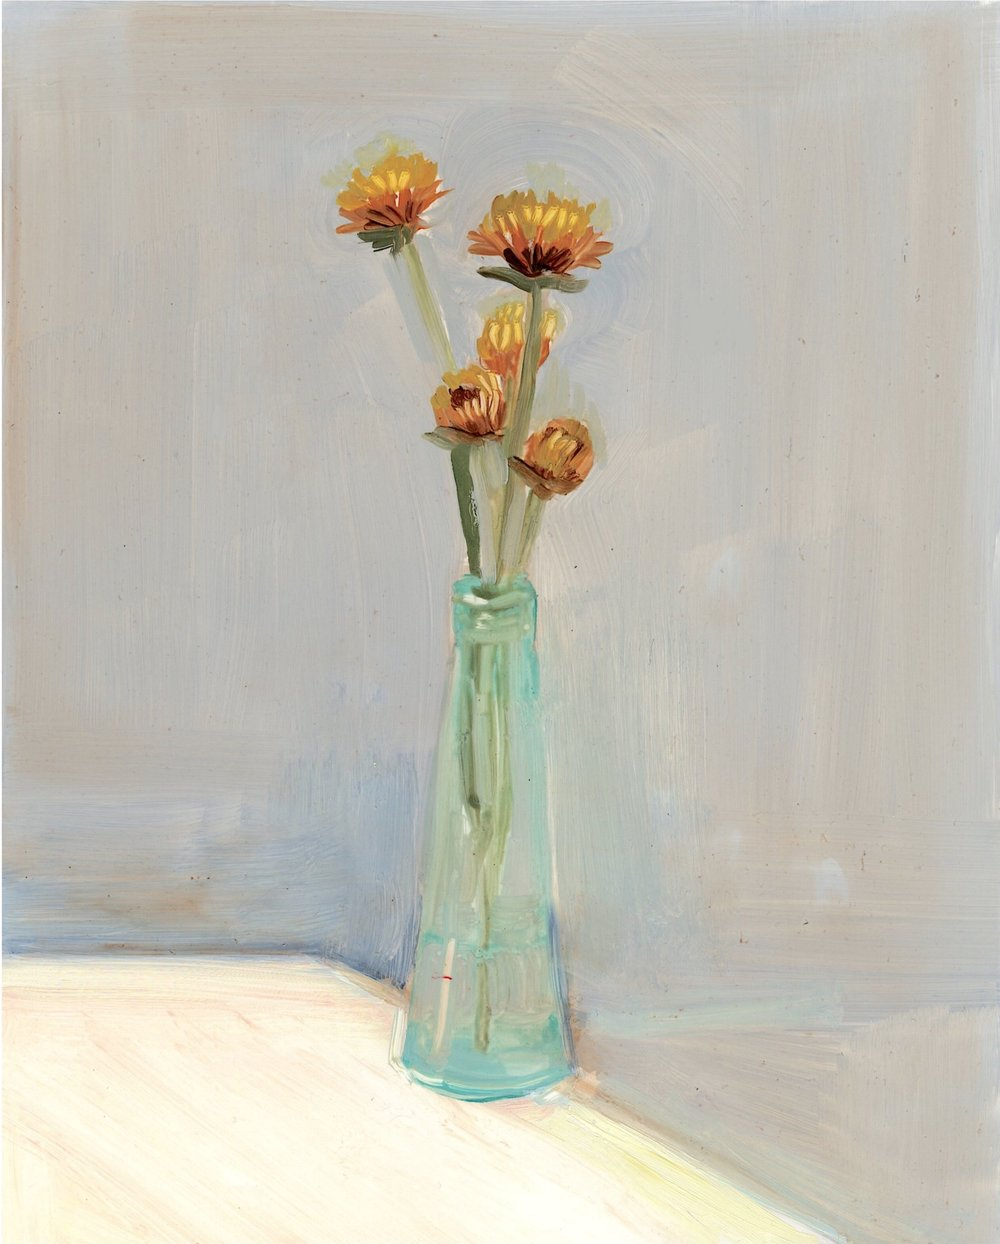 Straw Flower in Teal Vase